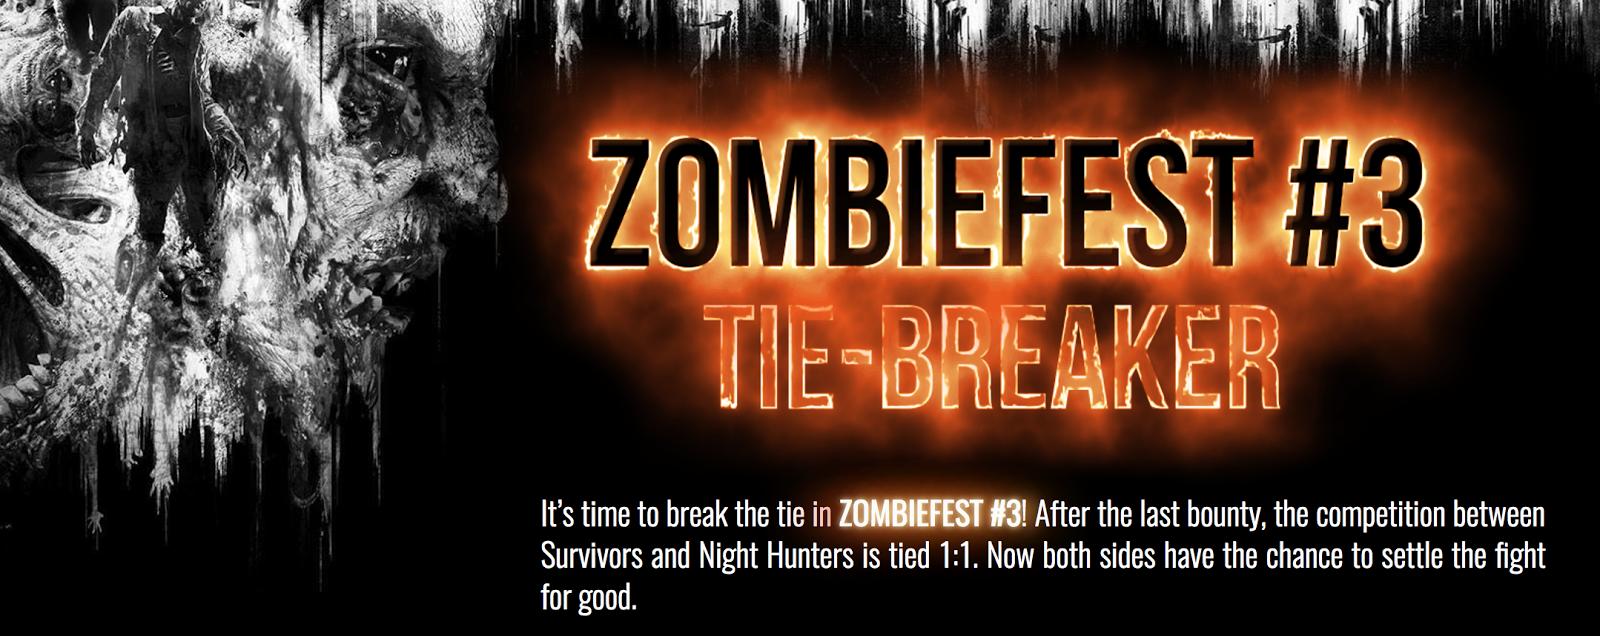 ¡Se anuncia el tercer Zombifest para Dying Light!, hay que desempatar